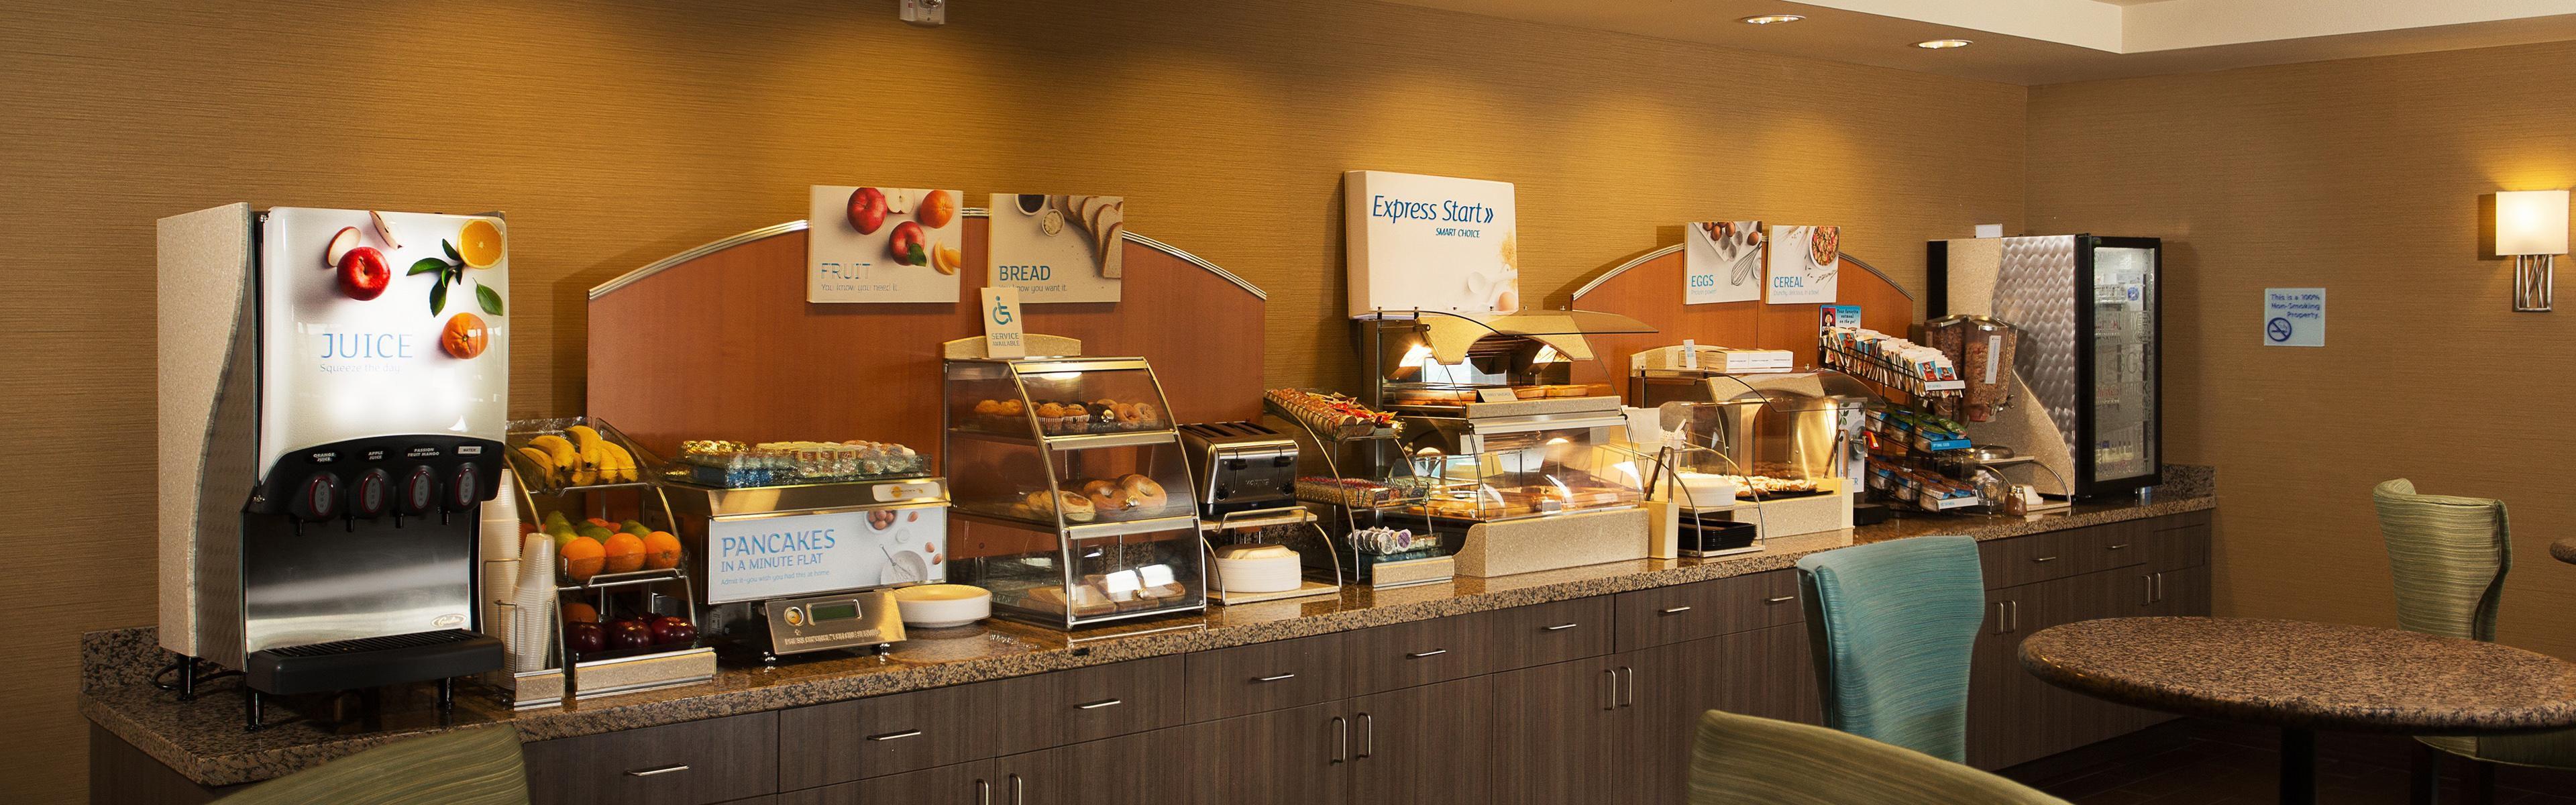 Holiday Inn Express & Suites Pocatello image 3